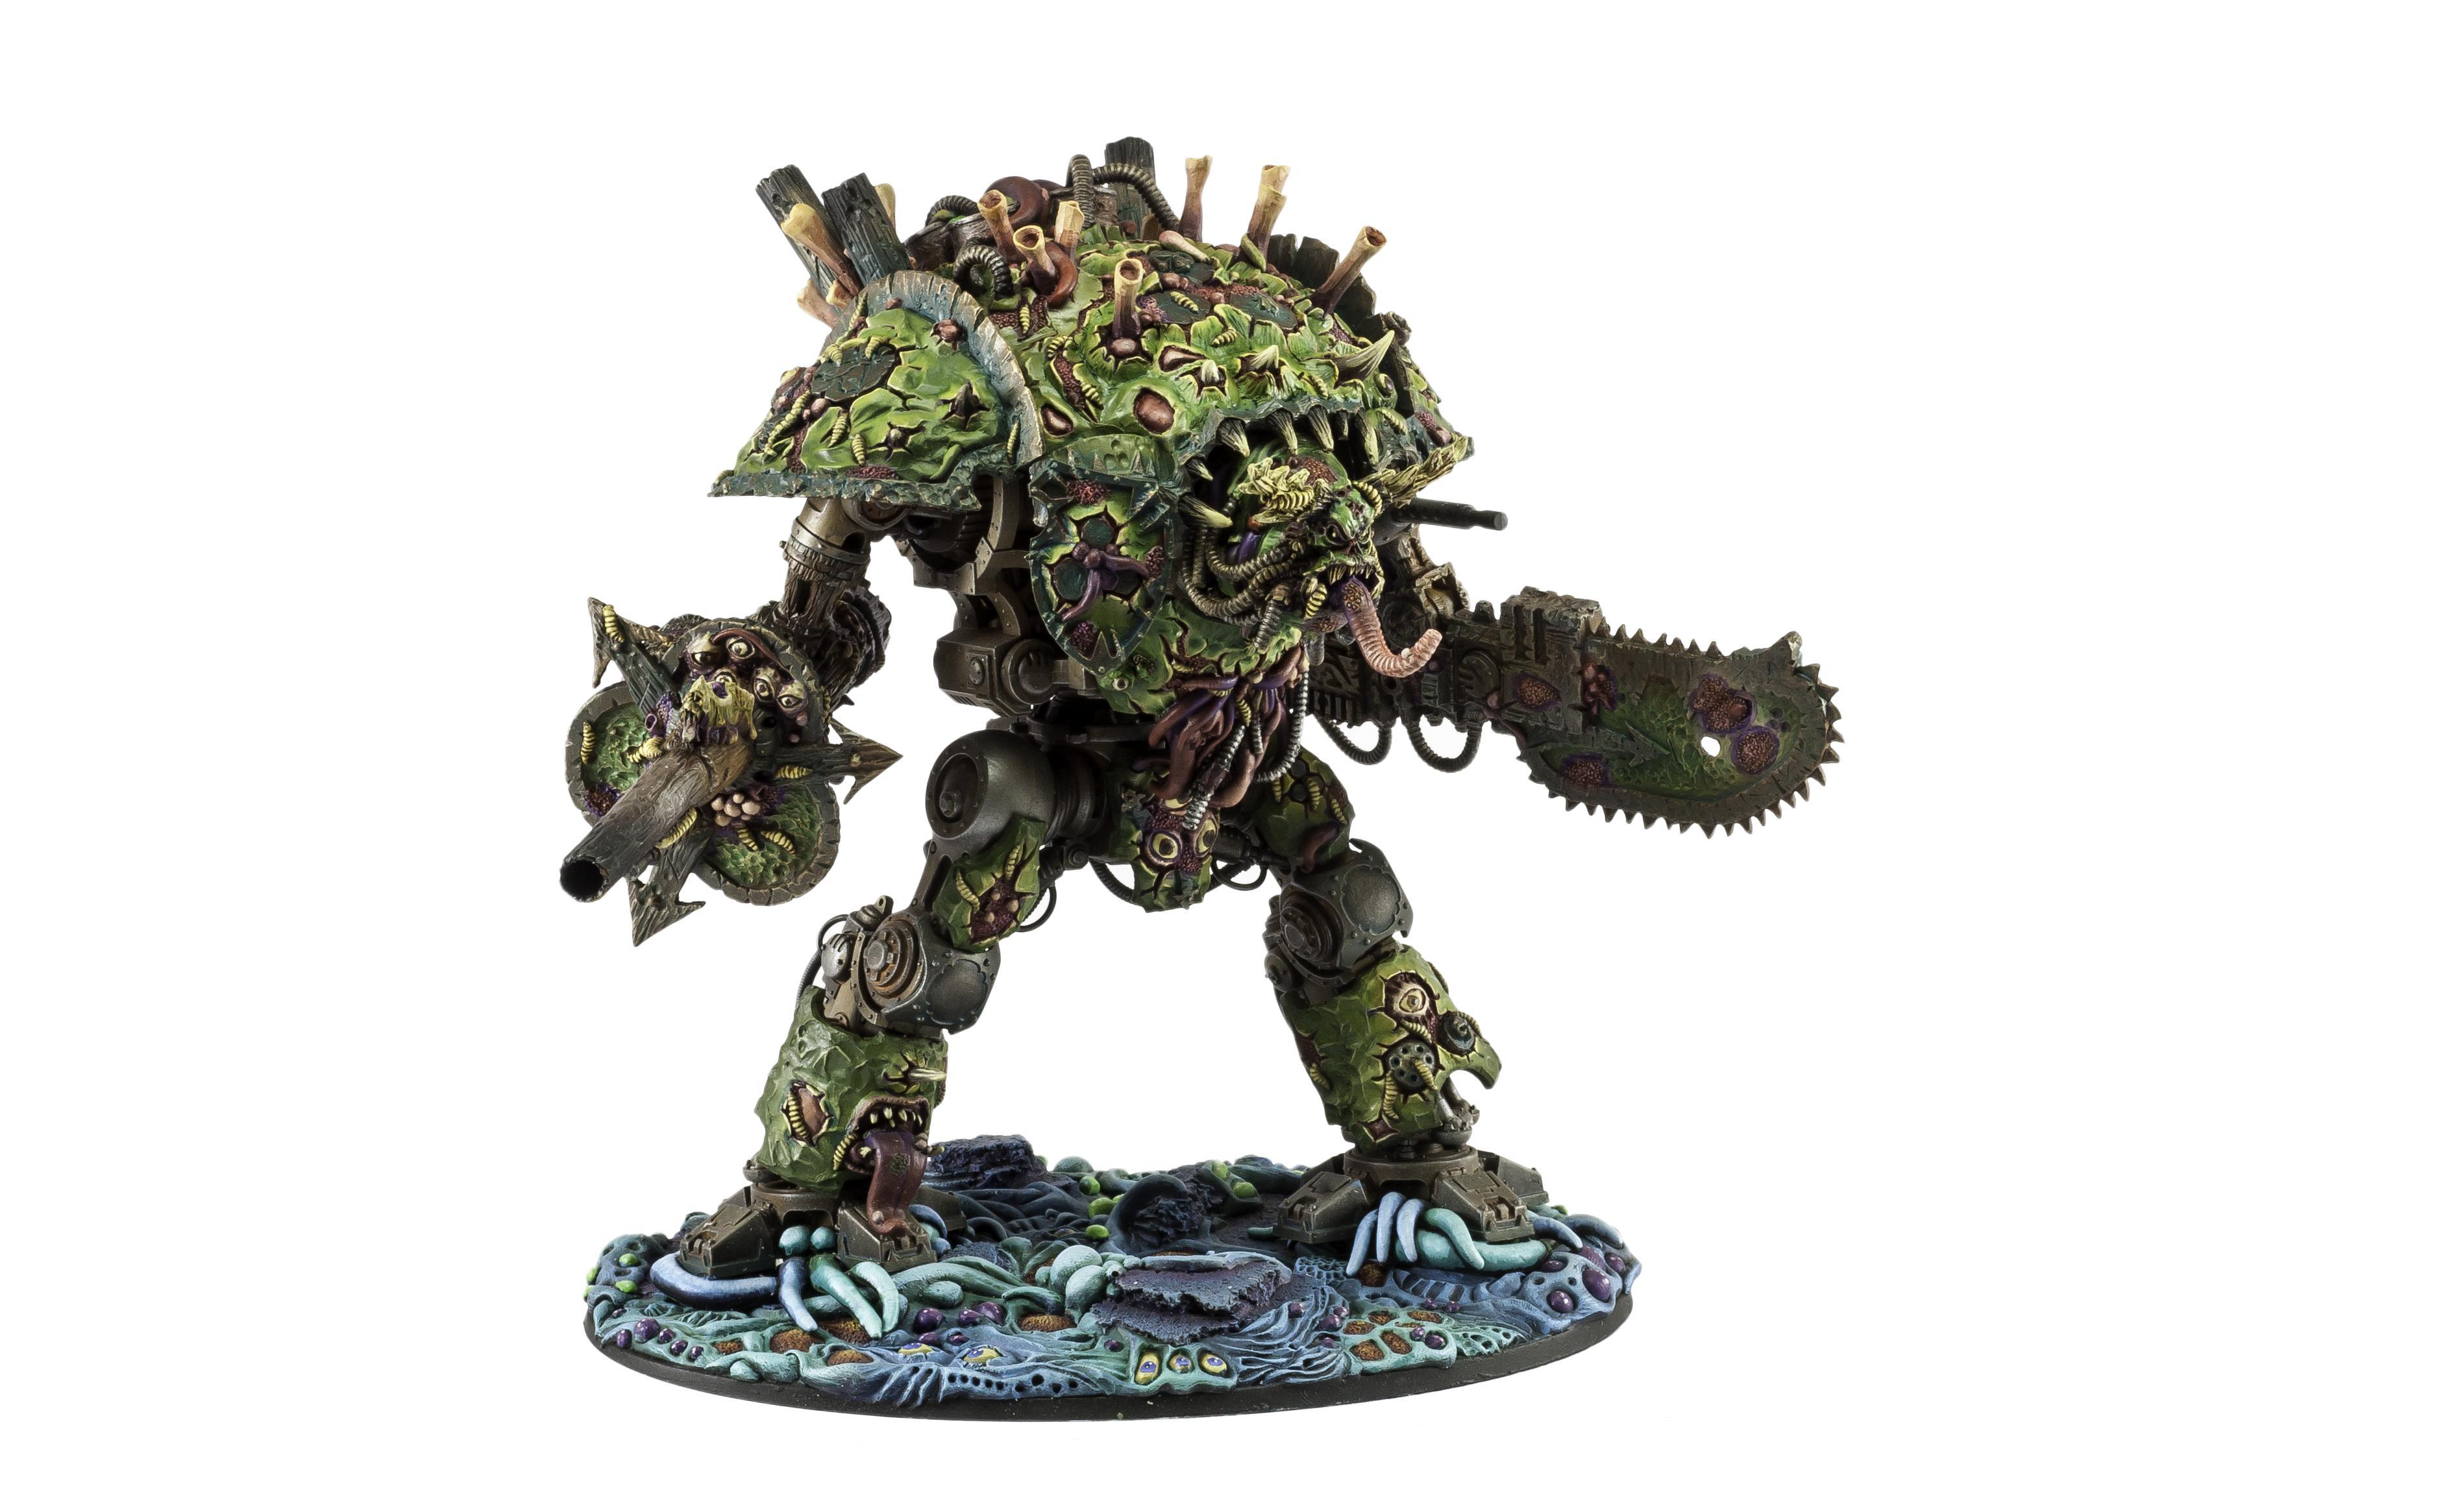 Chaos Daemons, Chaos Space Marines, Warhammer 40,000